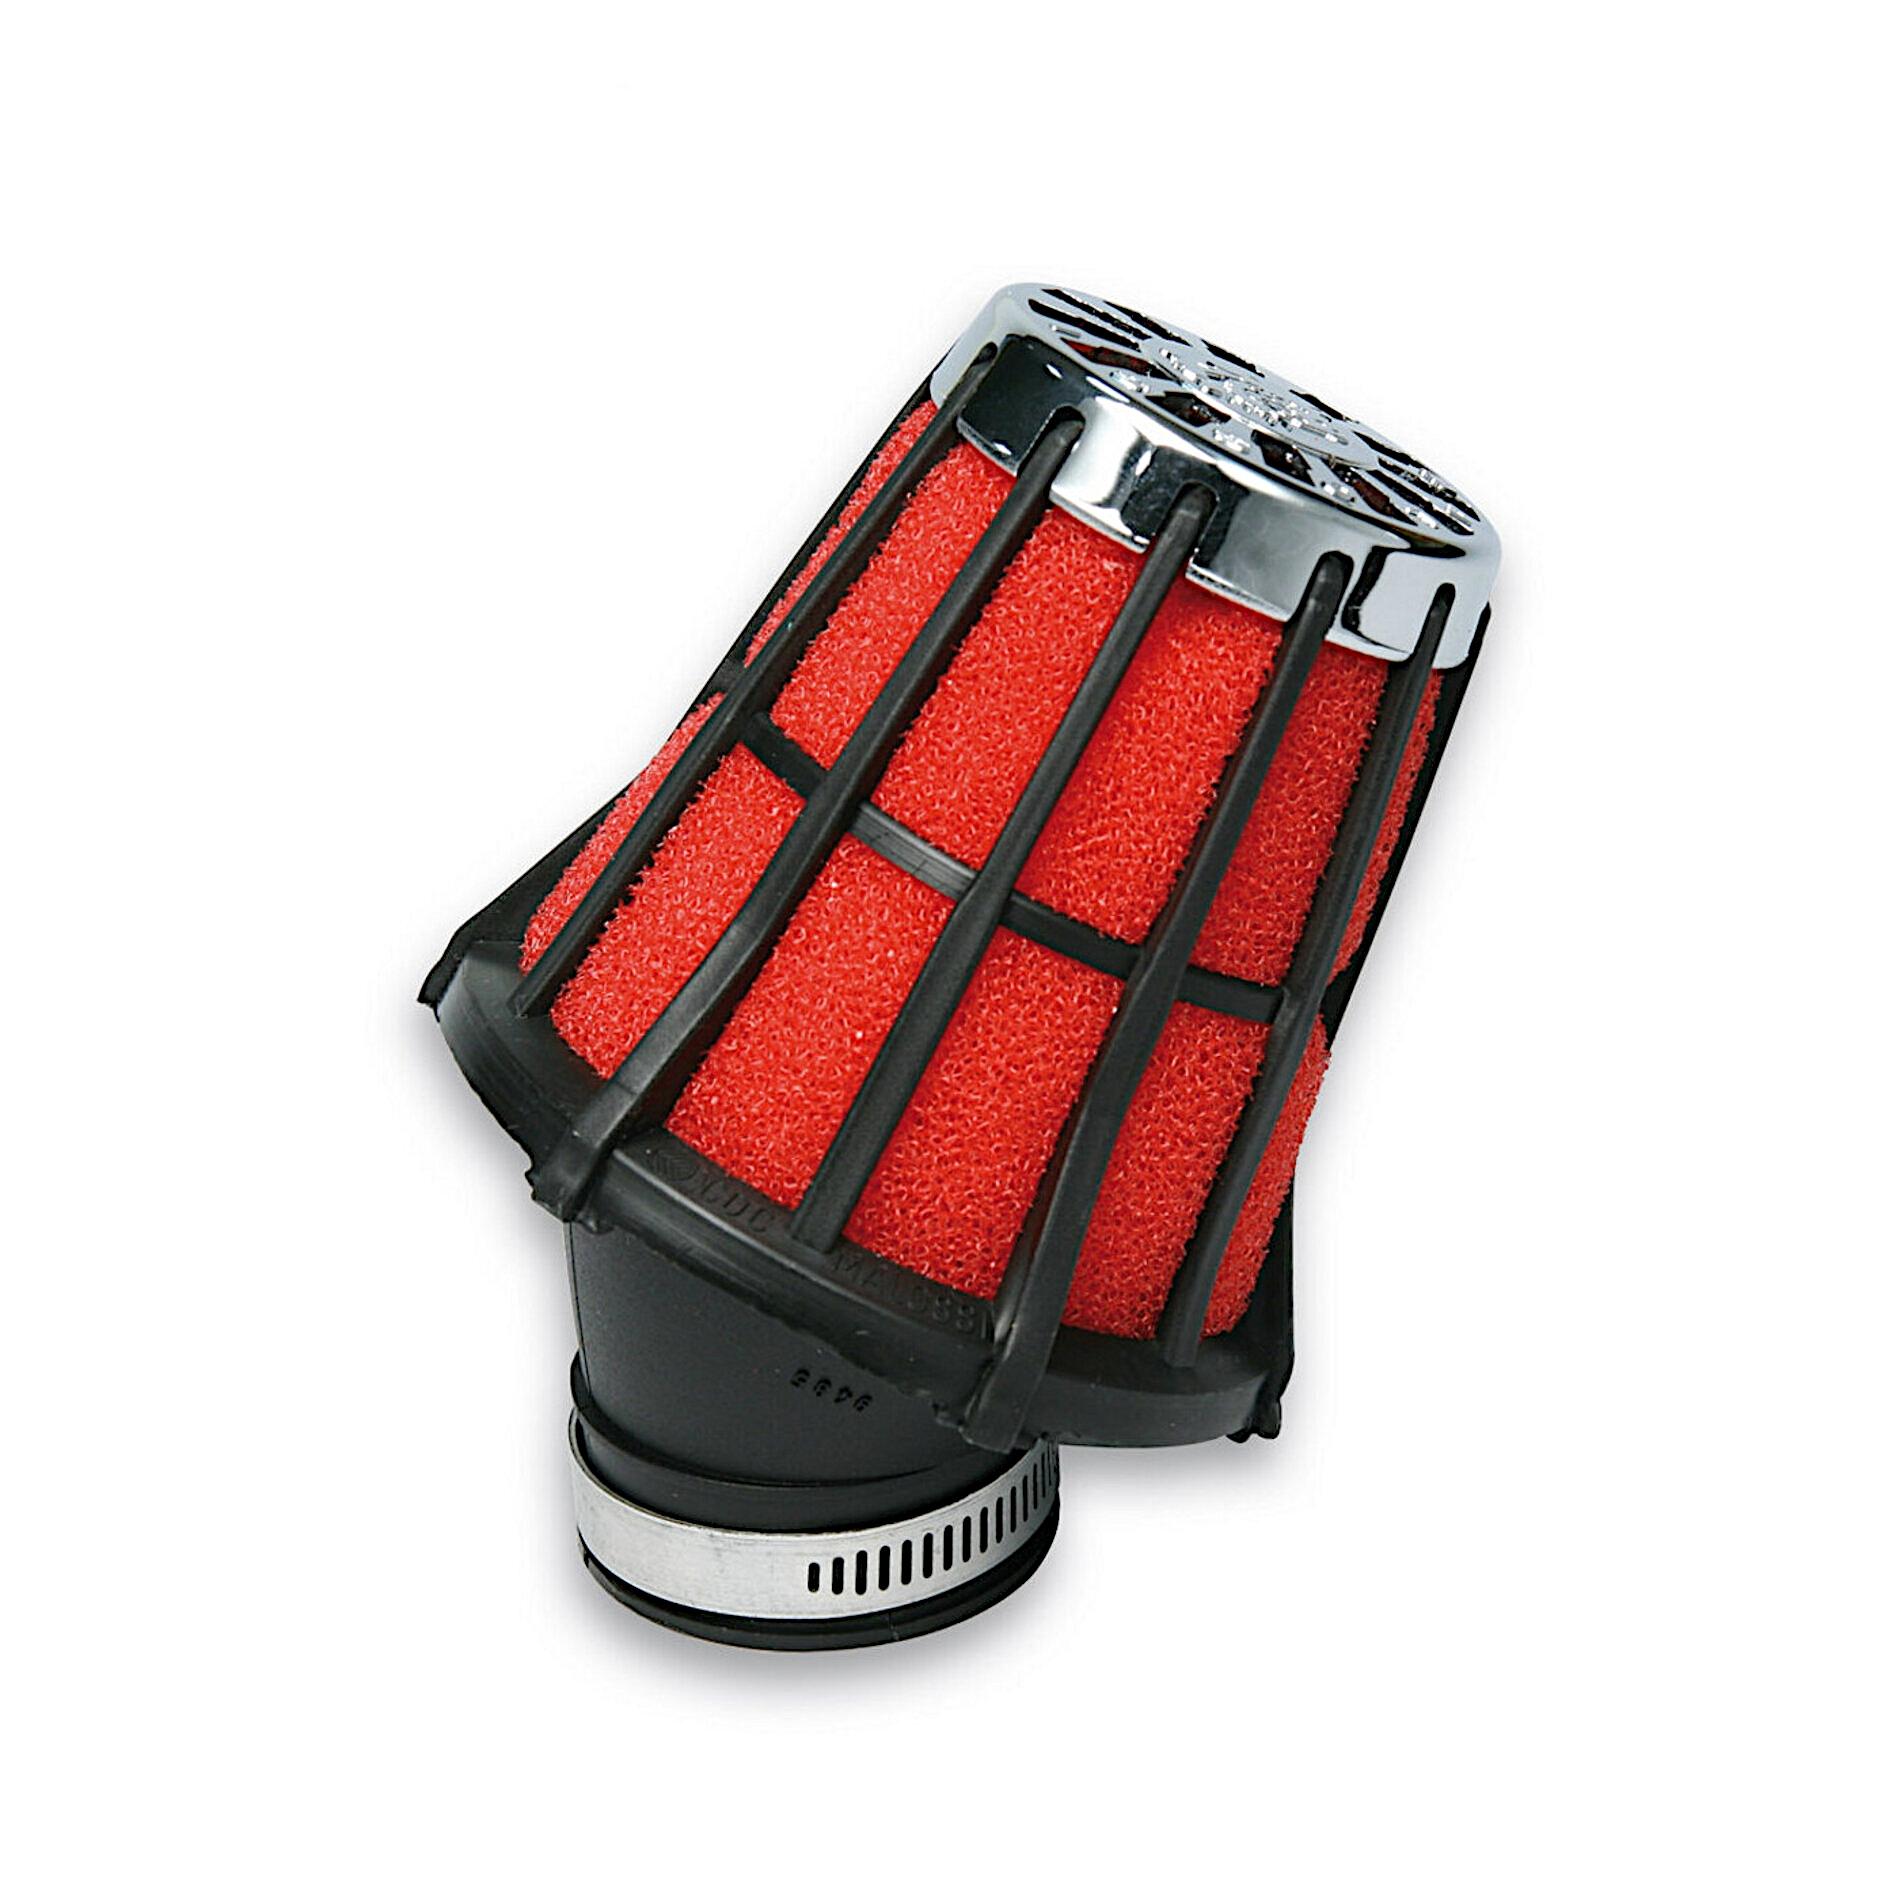 Filtre à air Malossi Red Filter E5 D.38 incliné 30